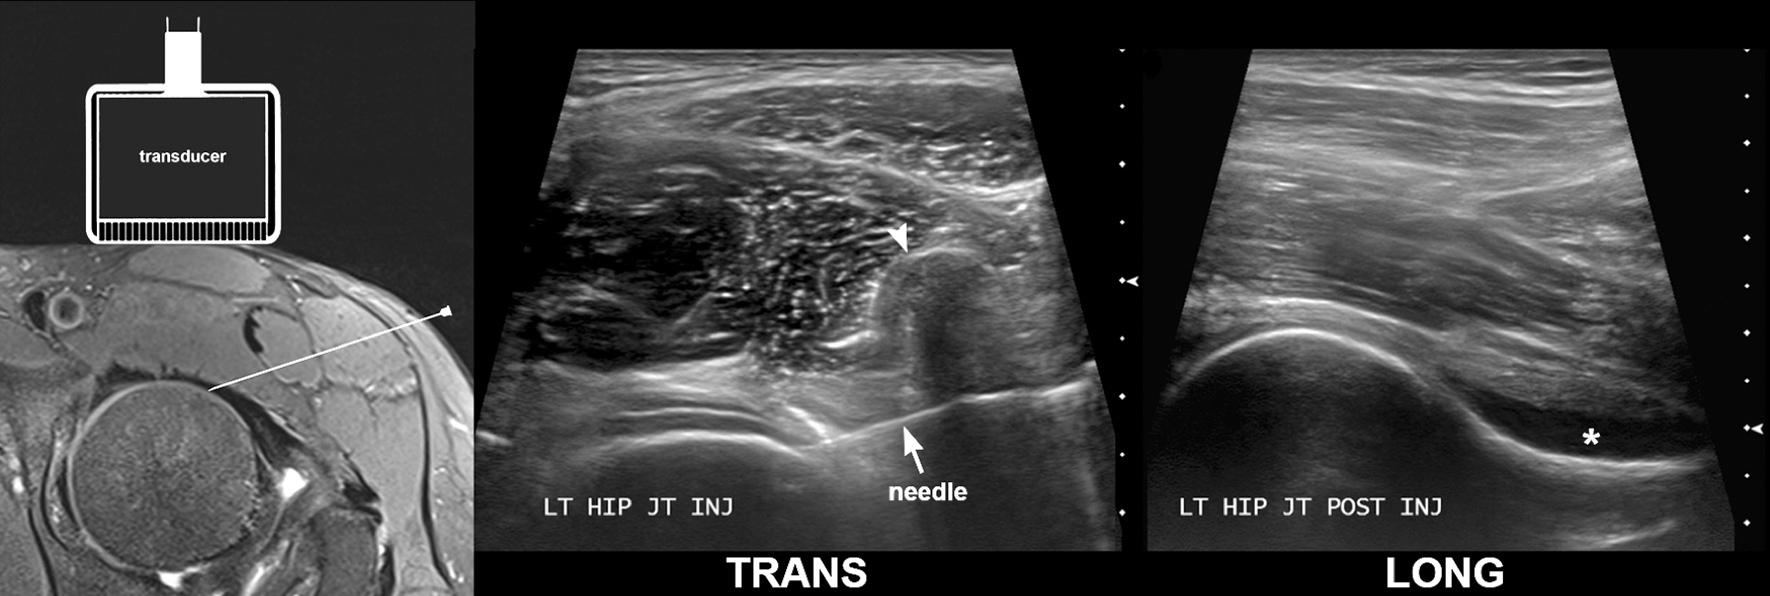 Hip Case 3 - Sports Medicine Imaging